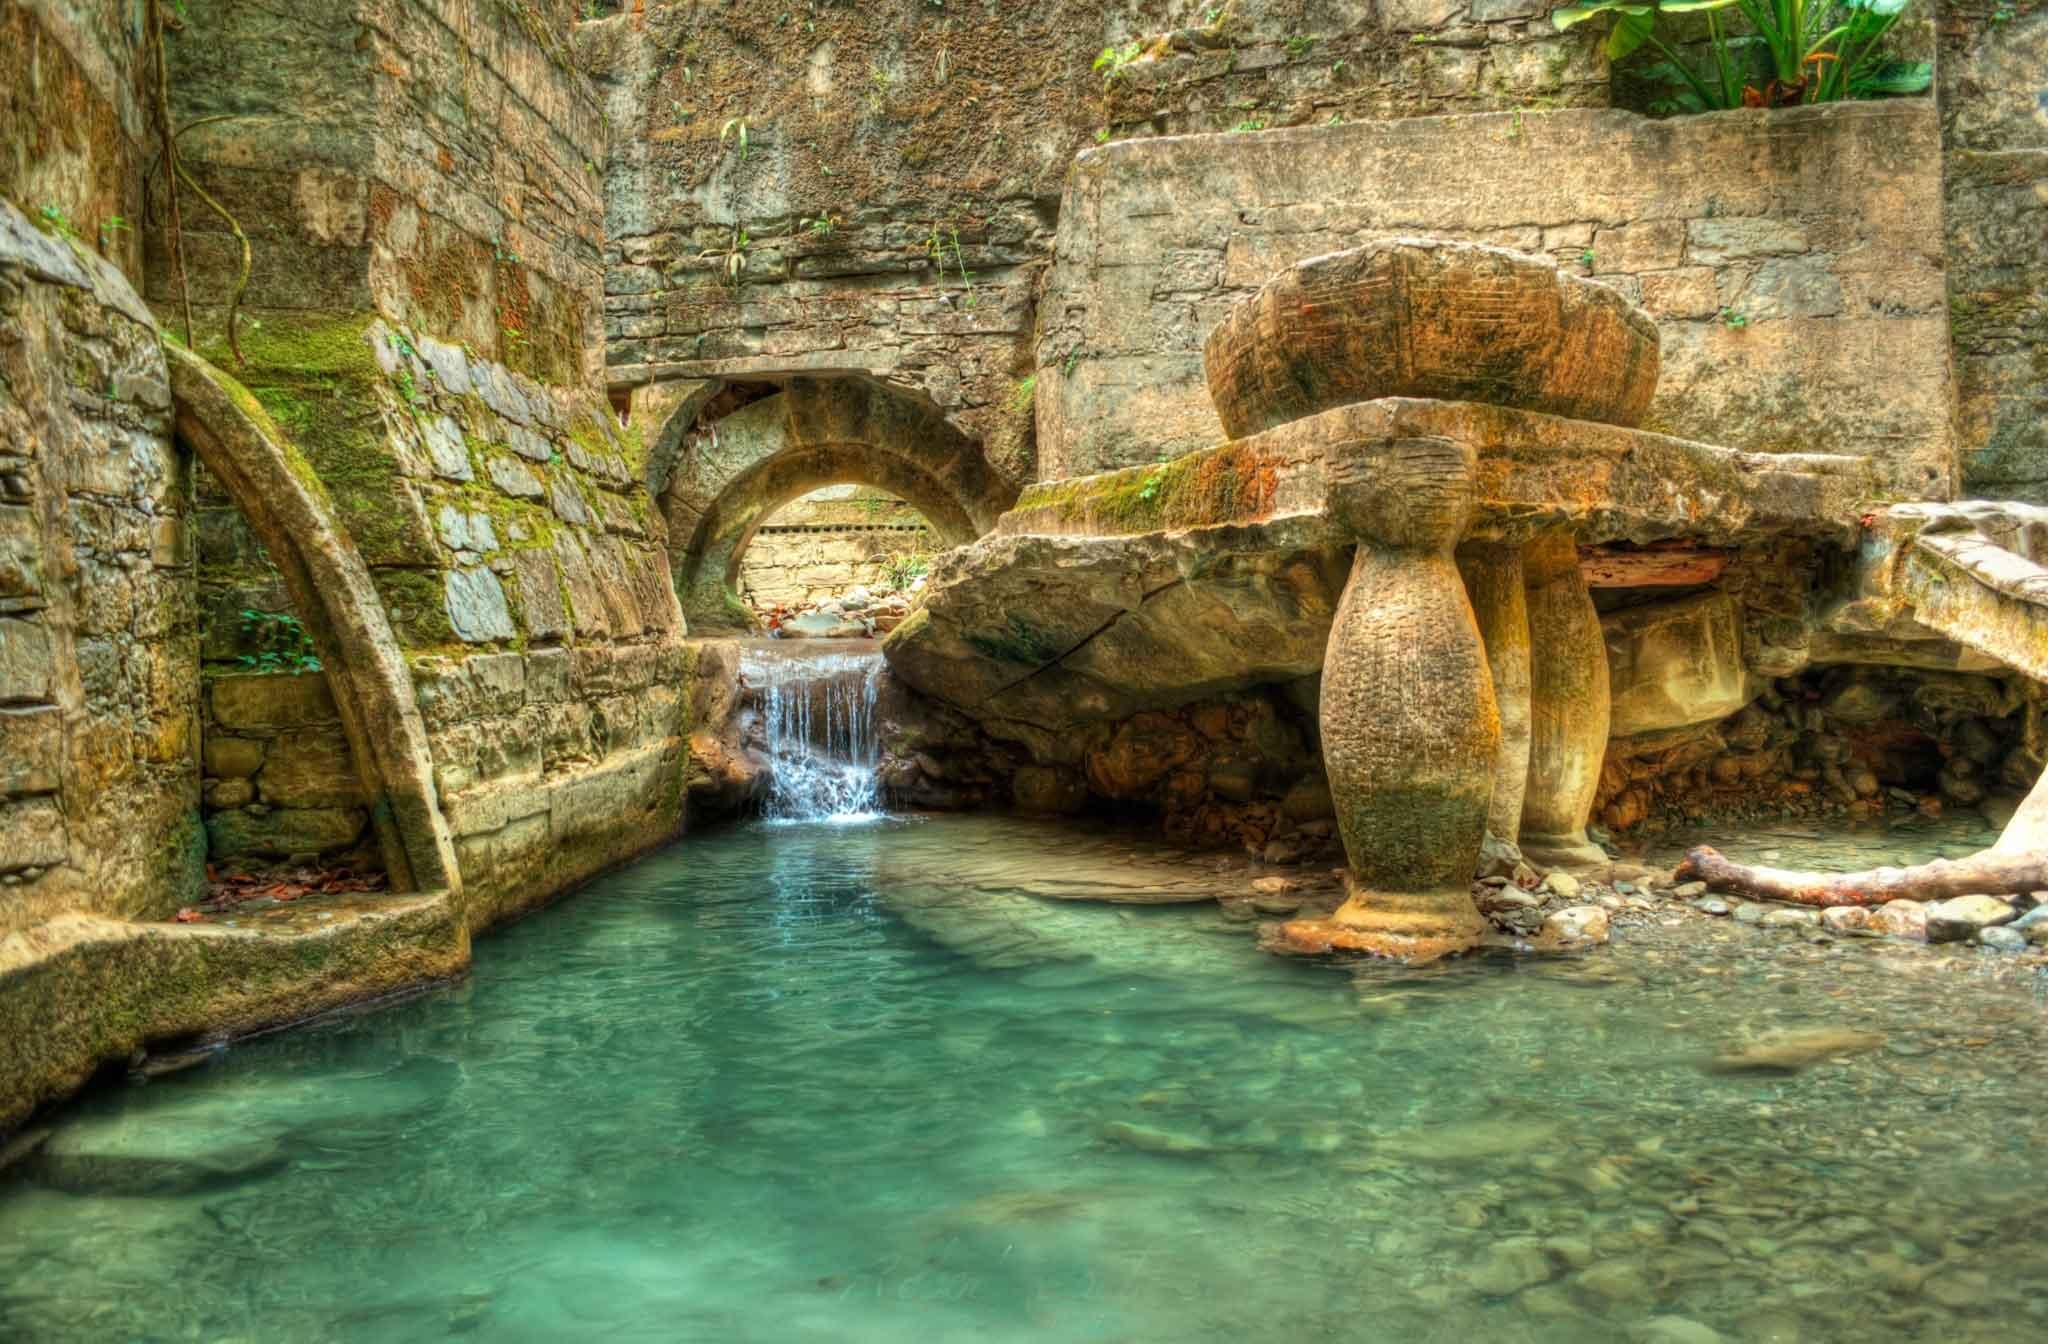 The-Most-Beautiful-Gardens-In-The-World-Las-Pozas-(Las-Pozas),-Mexico